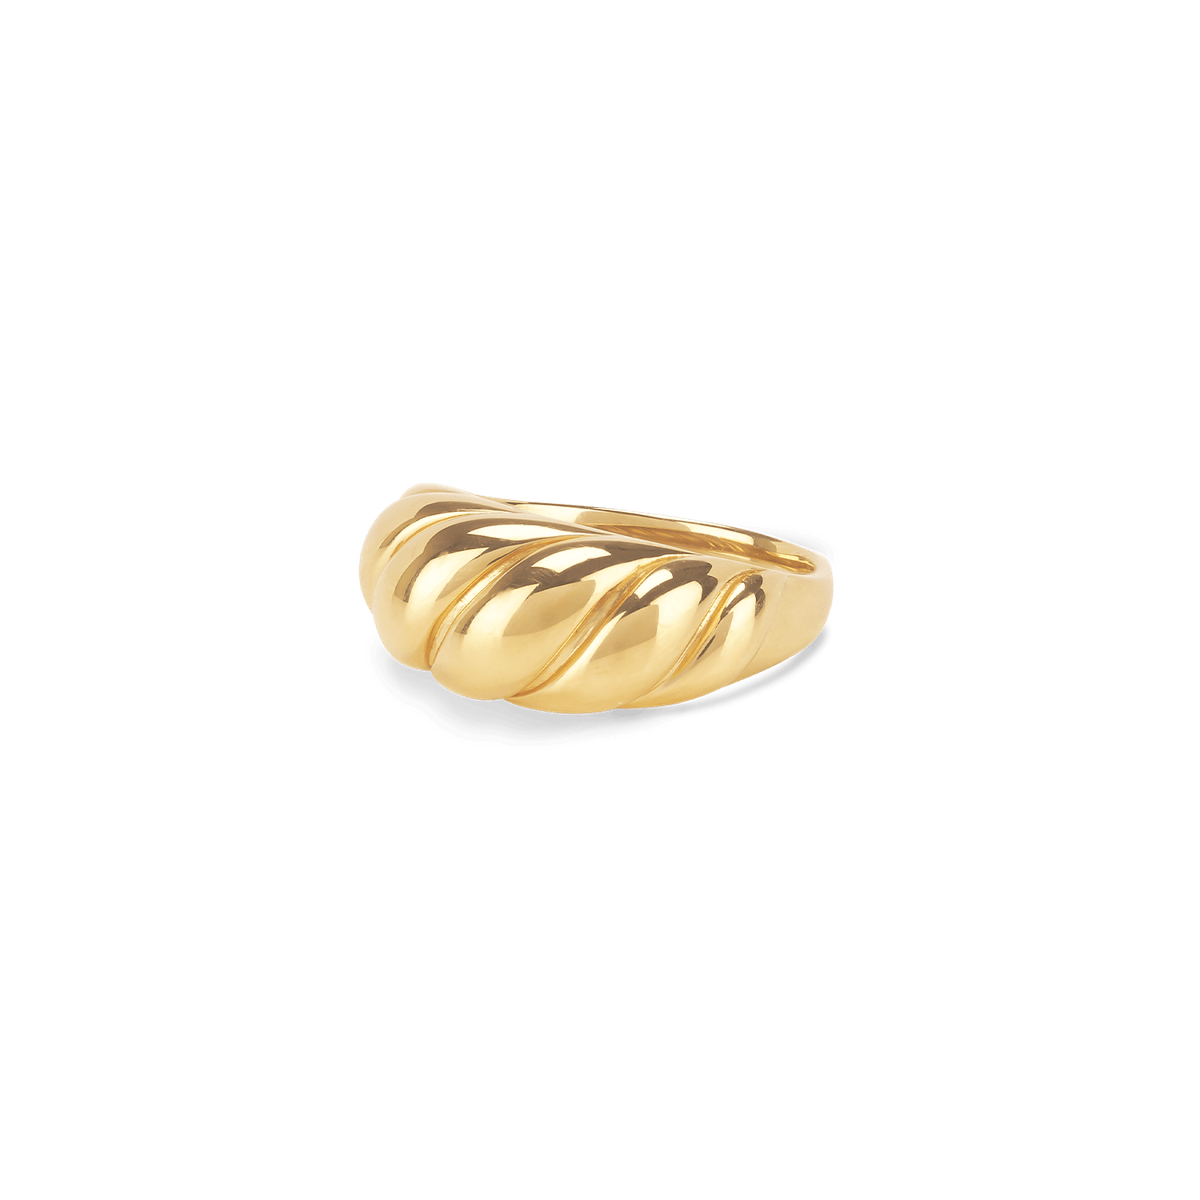 Croissant Dôme Ring in Gold Vermeil